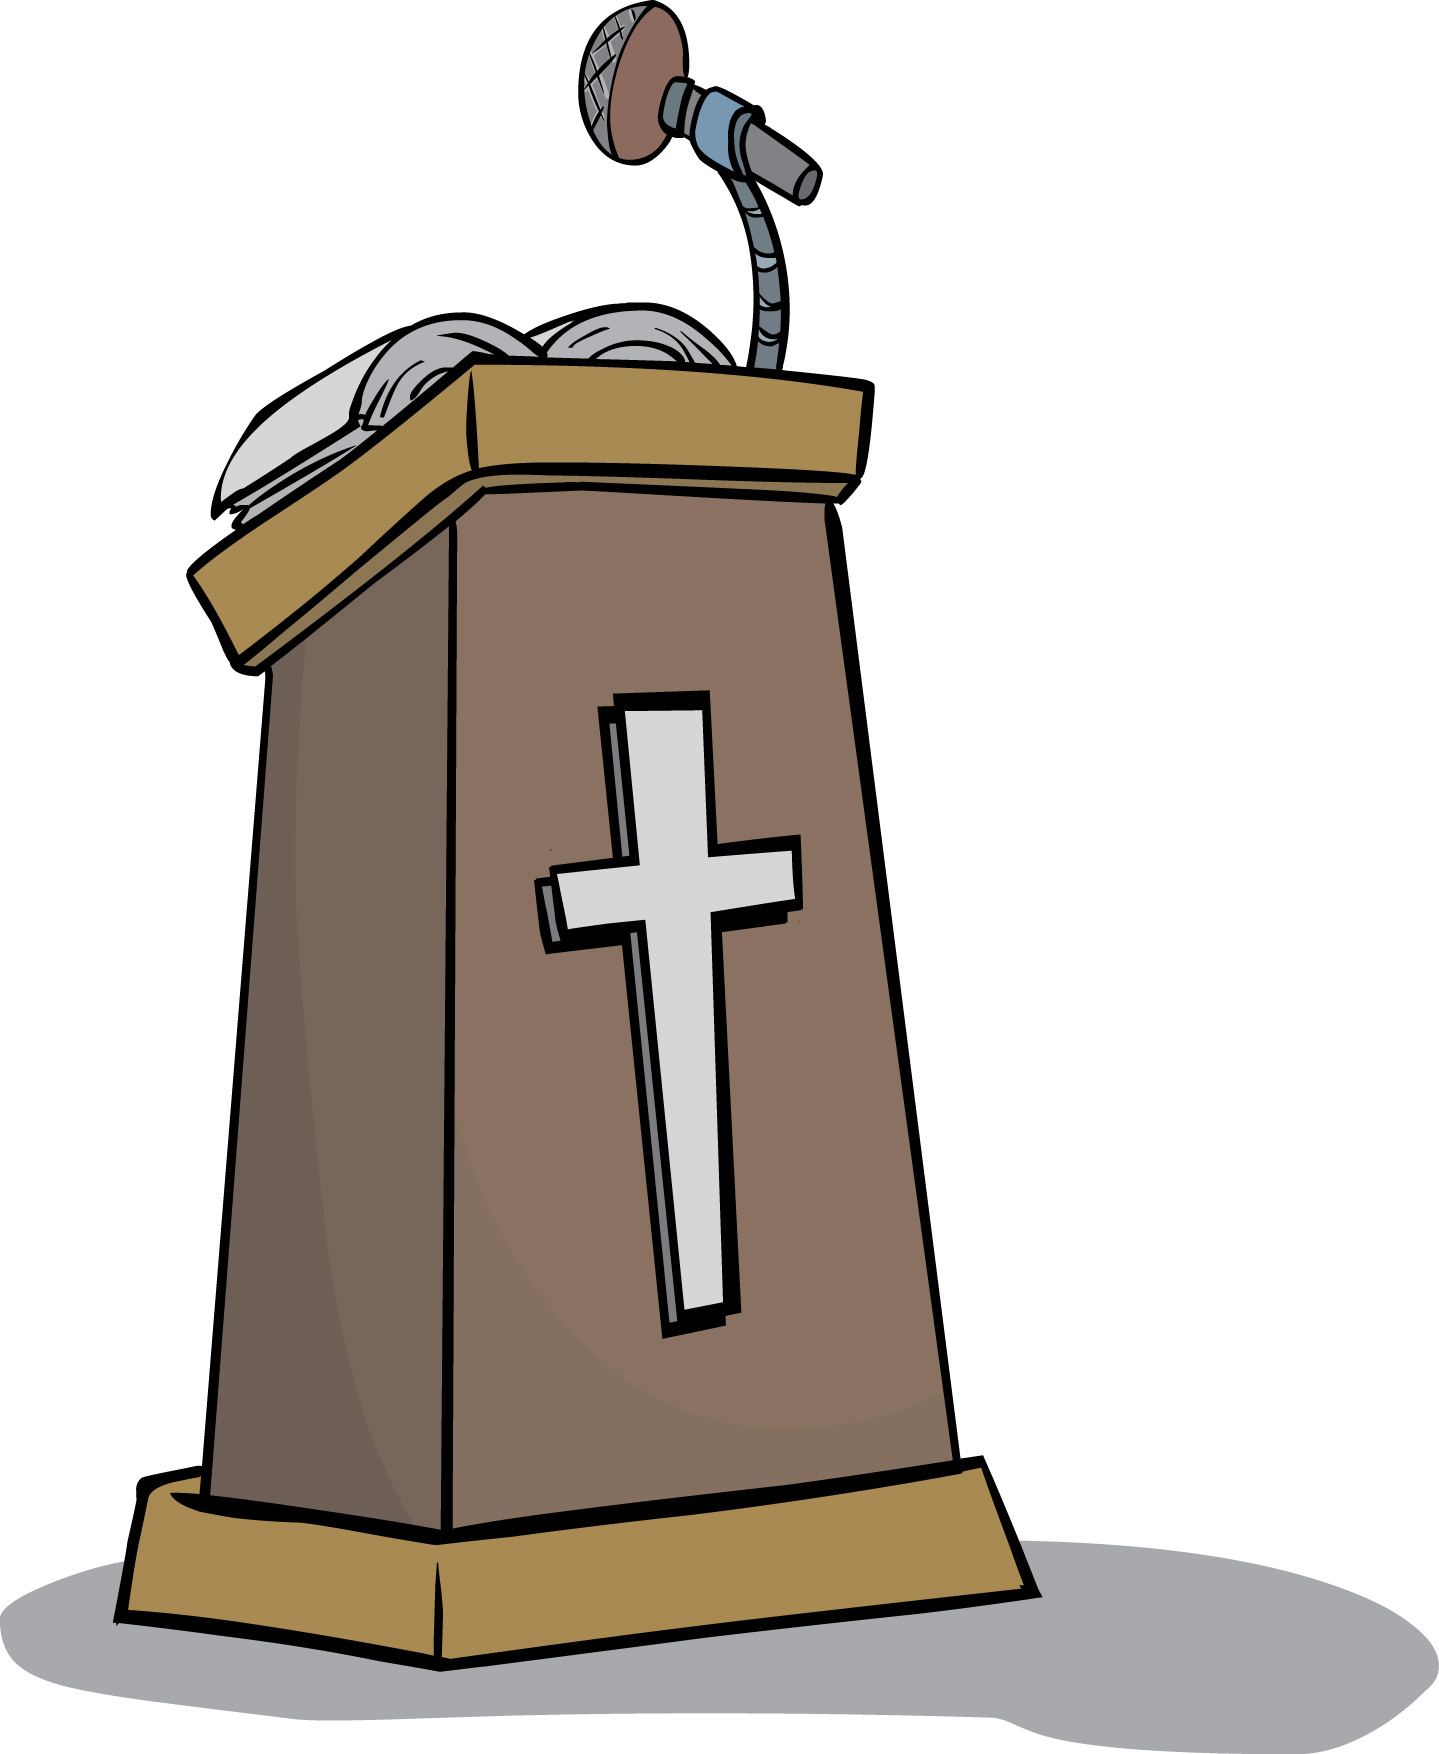 Free church cliparts download. Podium clipart pulpit